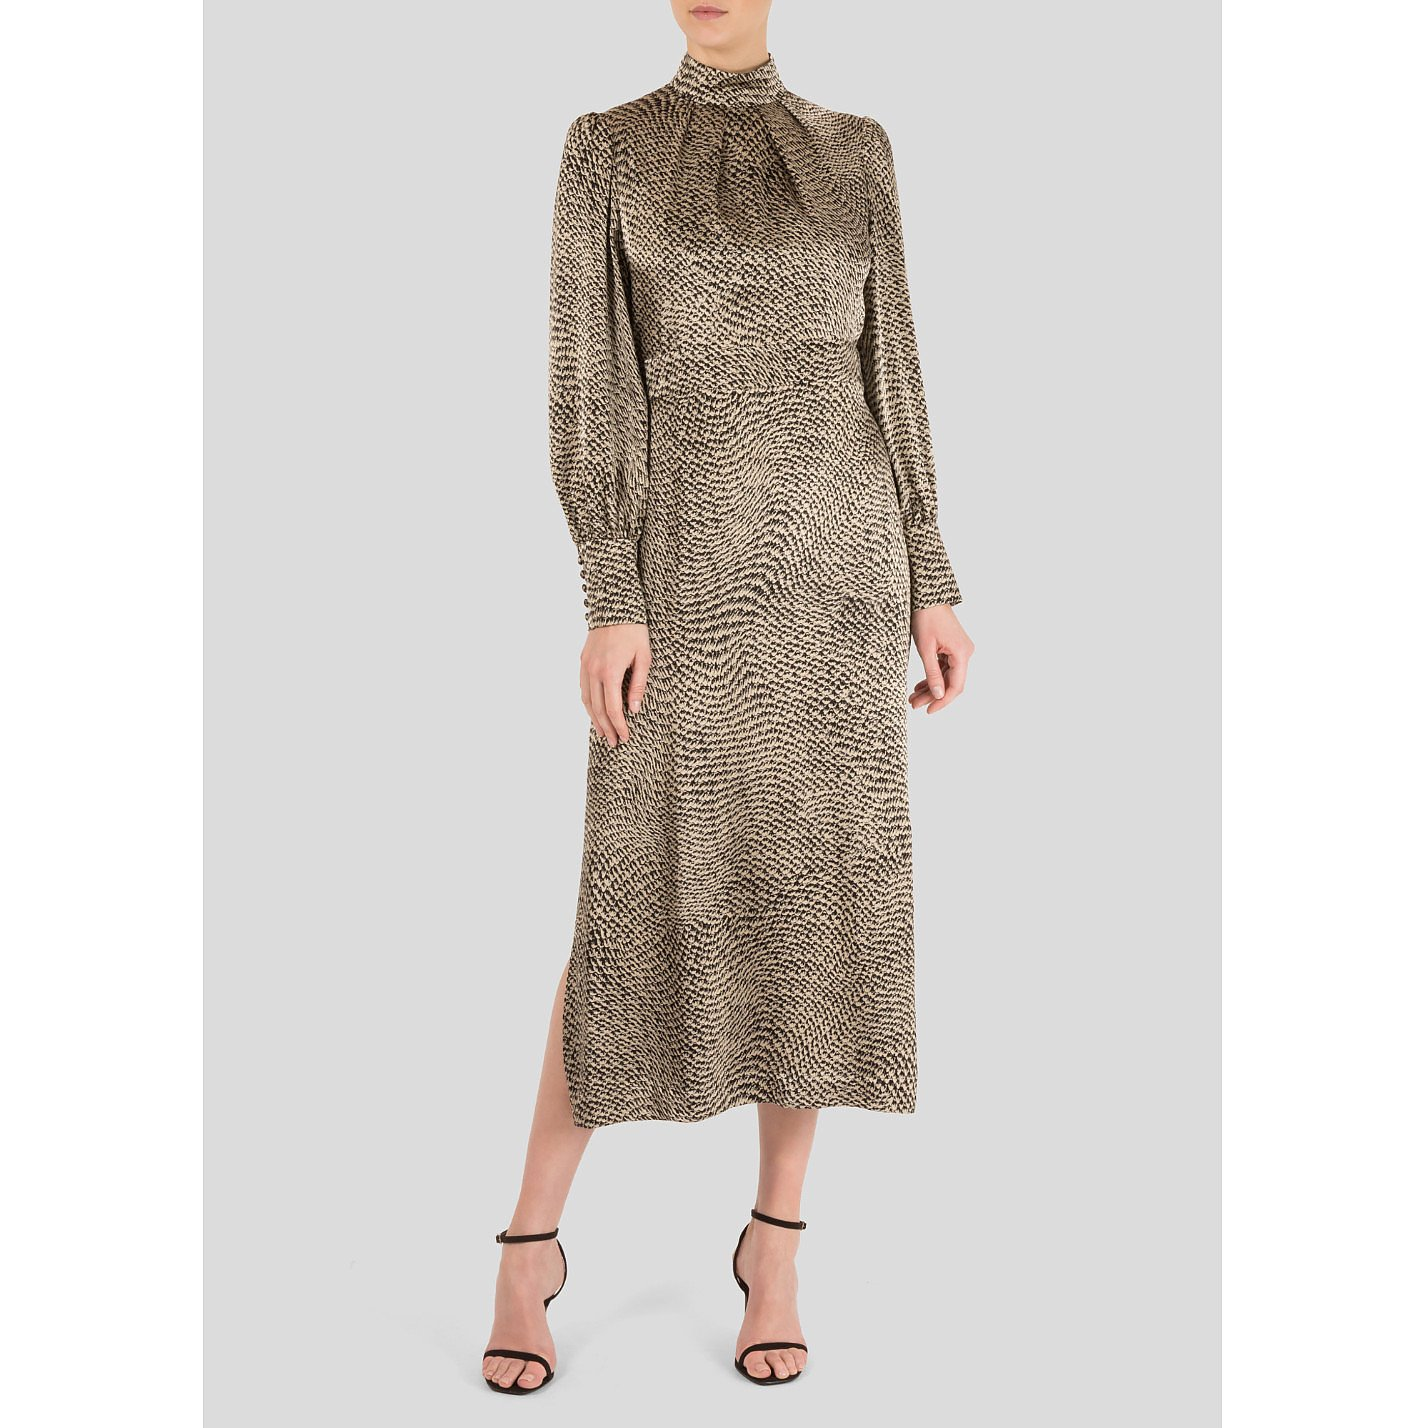 Miranda Dunn Saskia Snake Print Dress